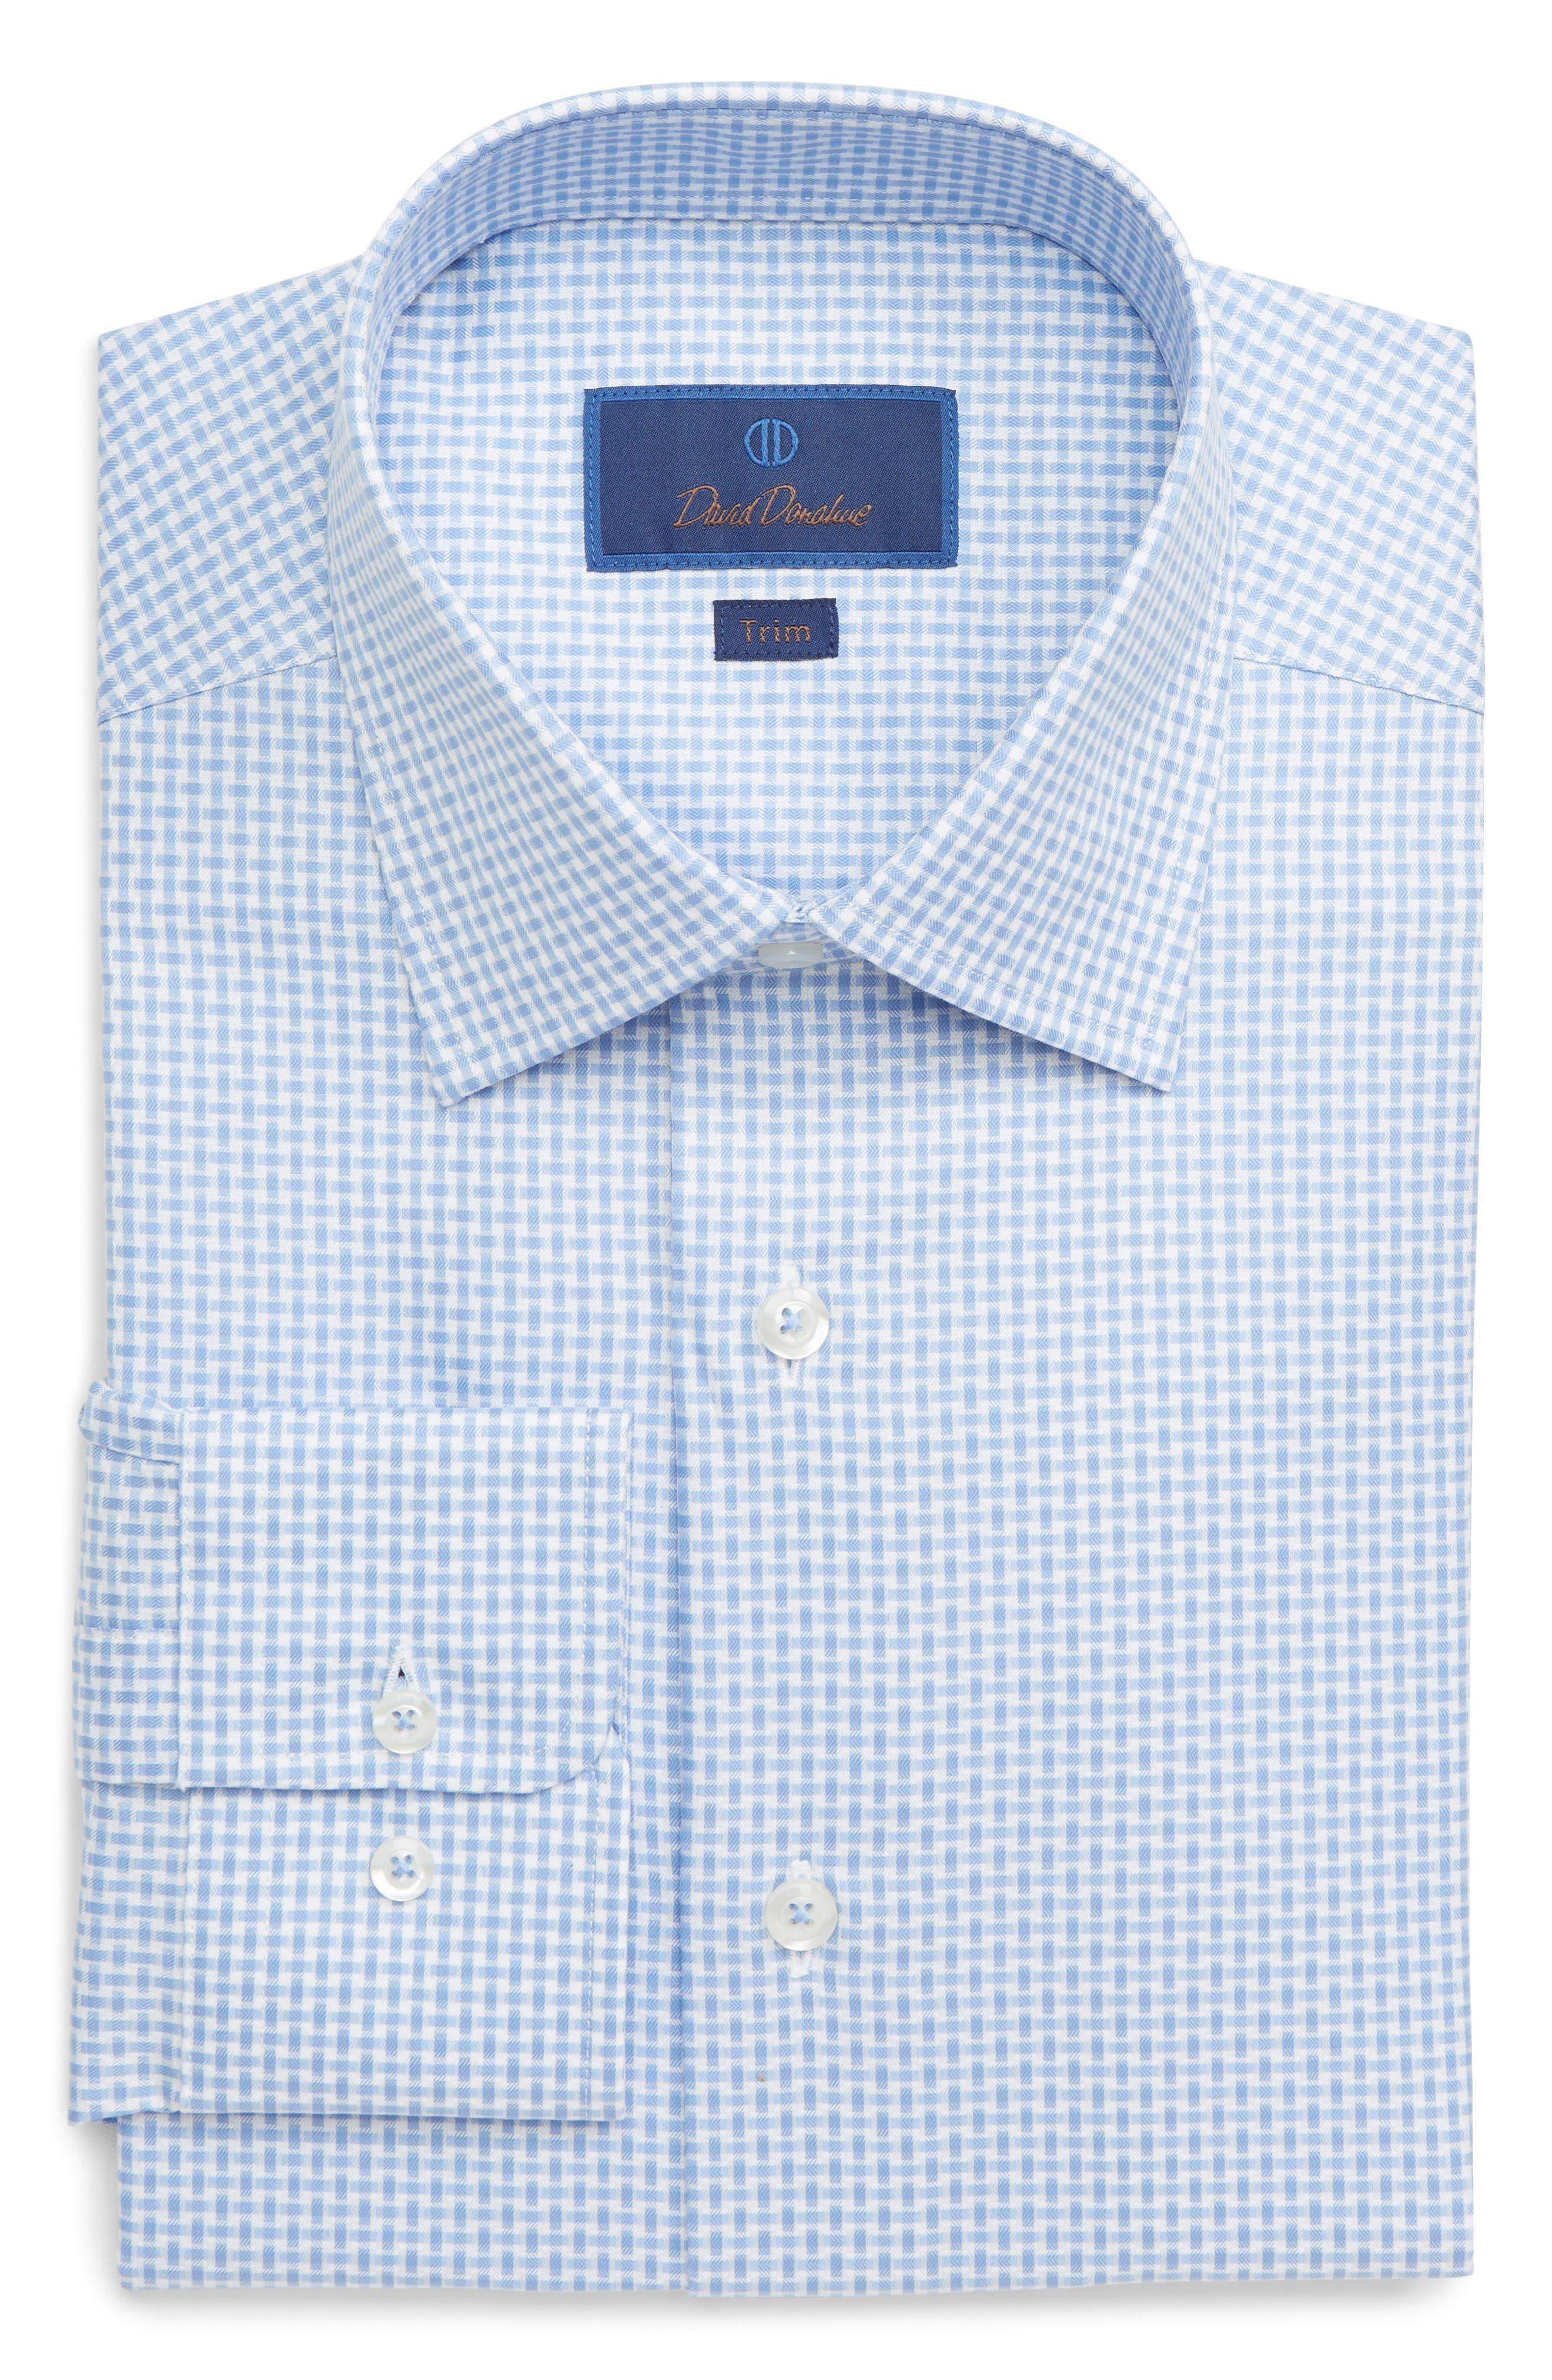 Trim Fit Print Dress Shirt,                             Main thumbnail 1, color,                             BLUE